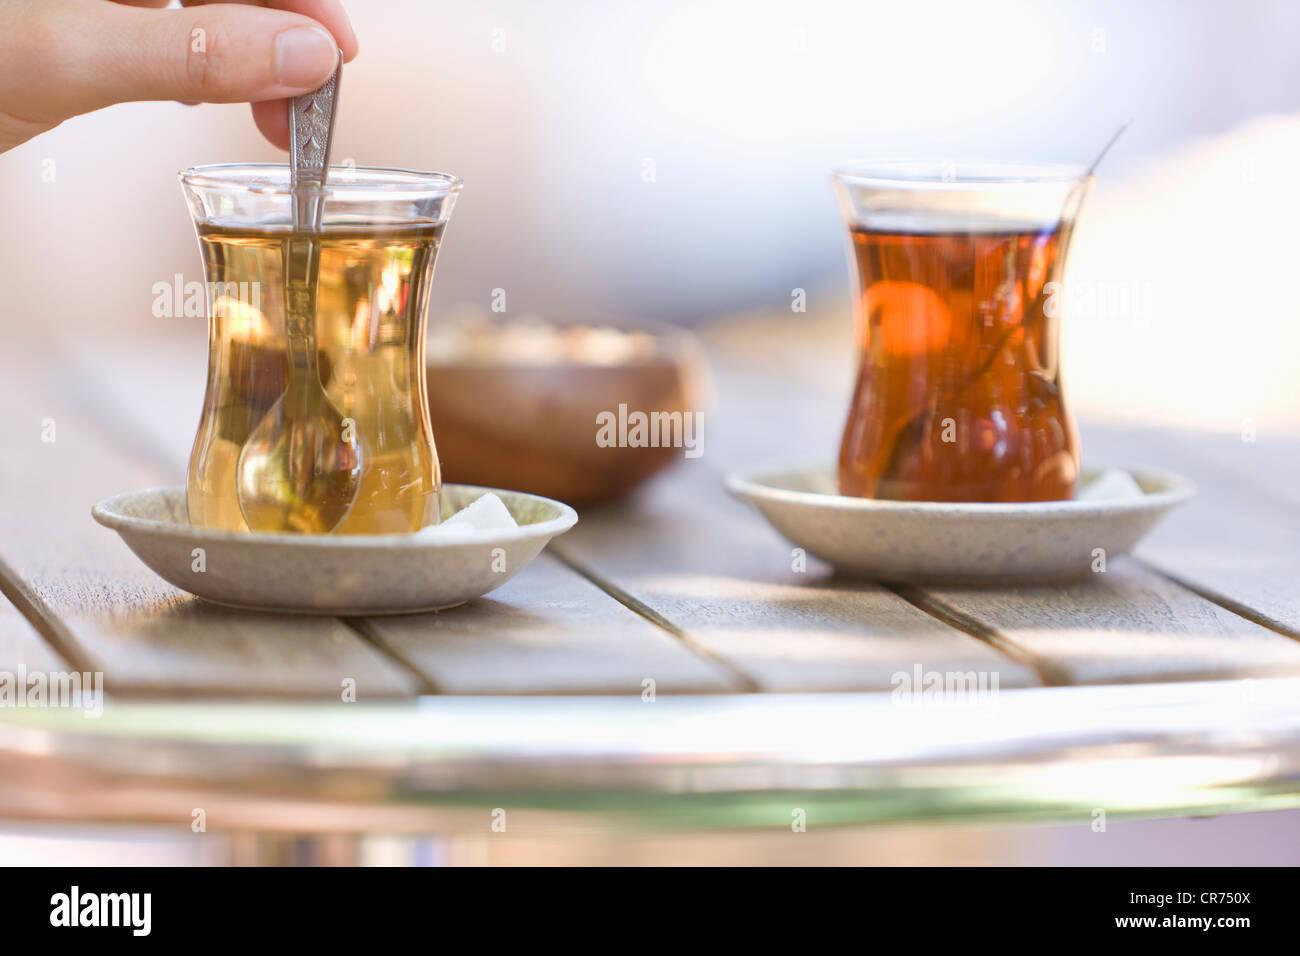 Turkey, Turkish tea, close up - Stock Image